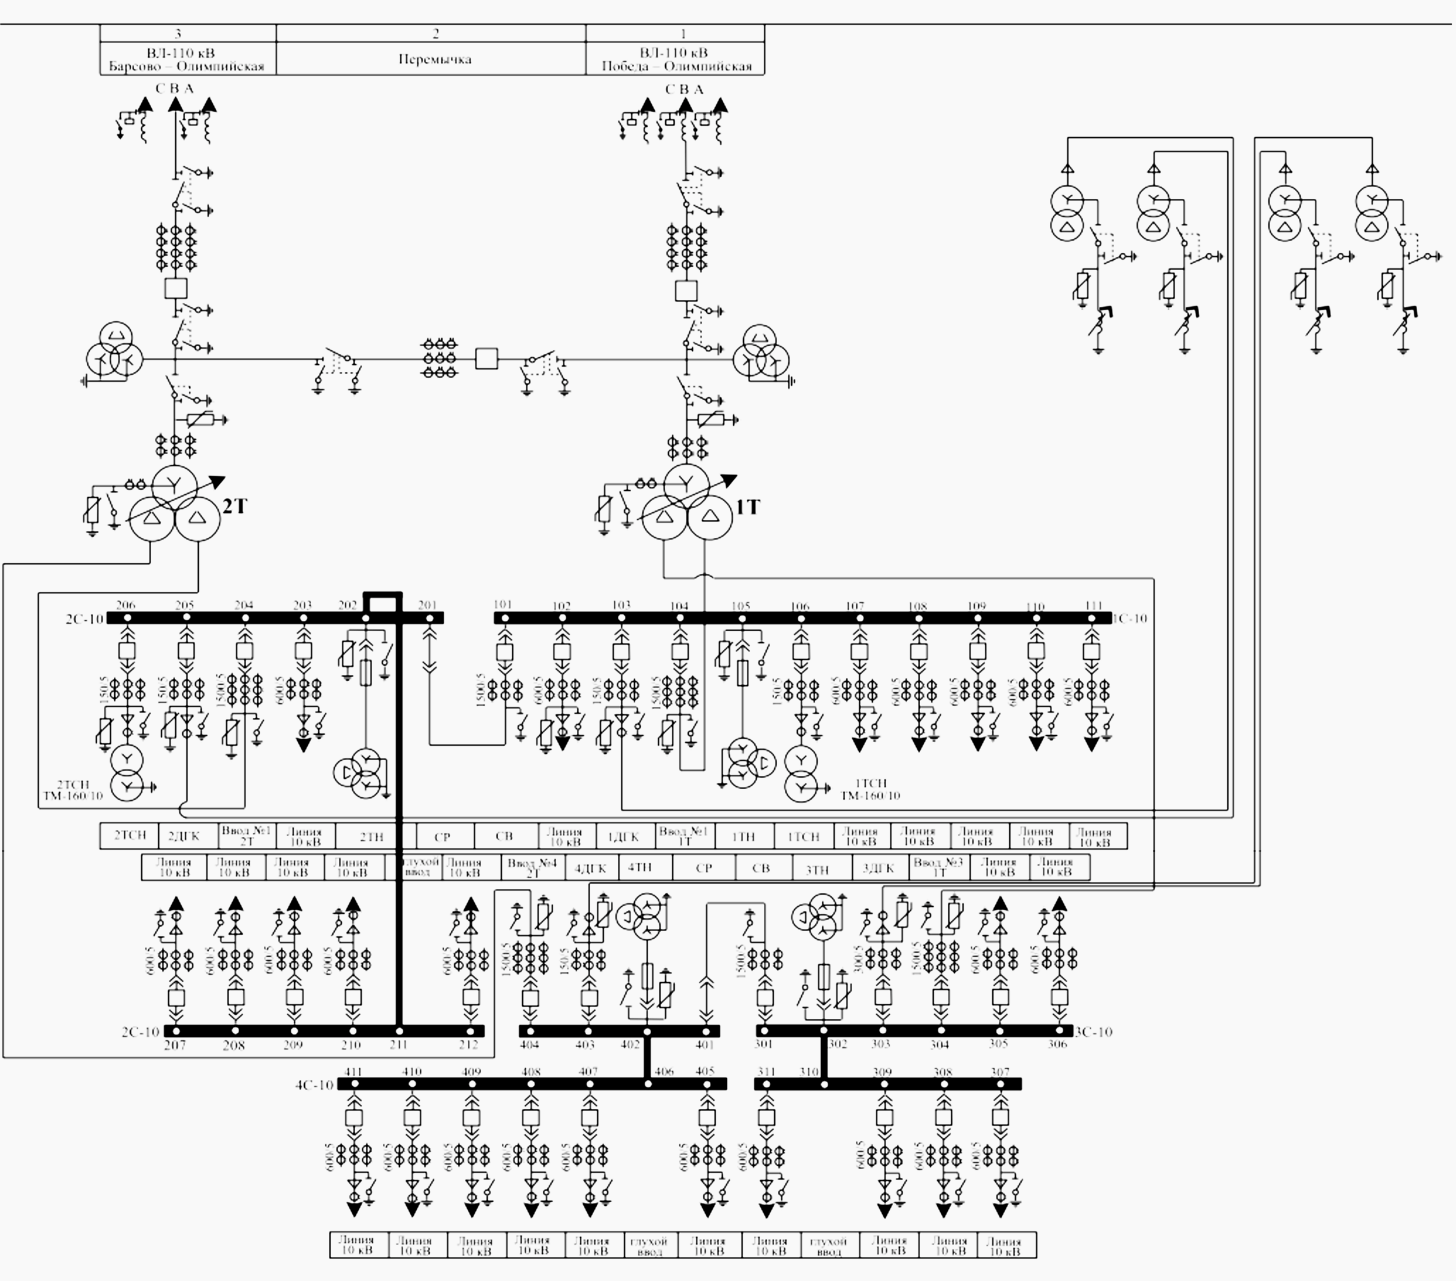 medium resolution of one line wiring diagram symbols wiring diagram online circuit schematic diagram single line electrical diagram symbols